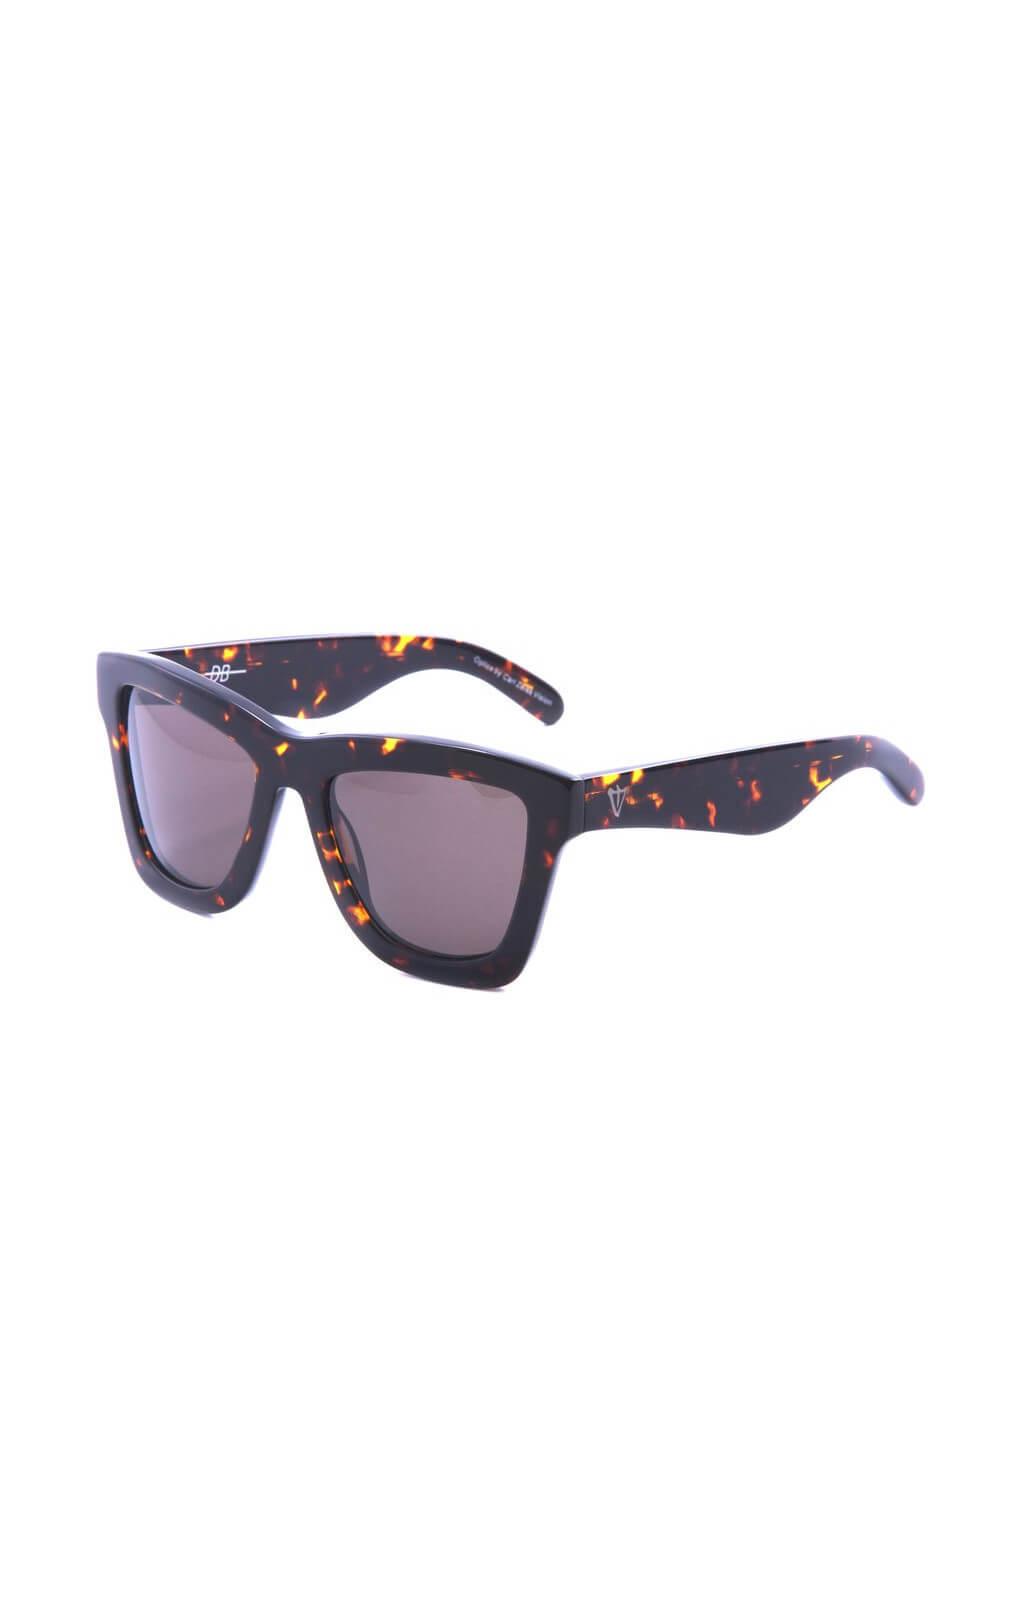 valley db sunglasses dark tortoise